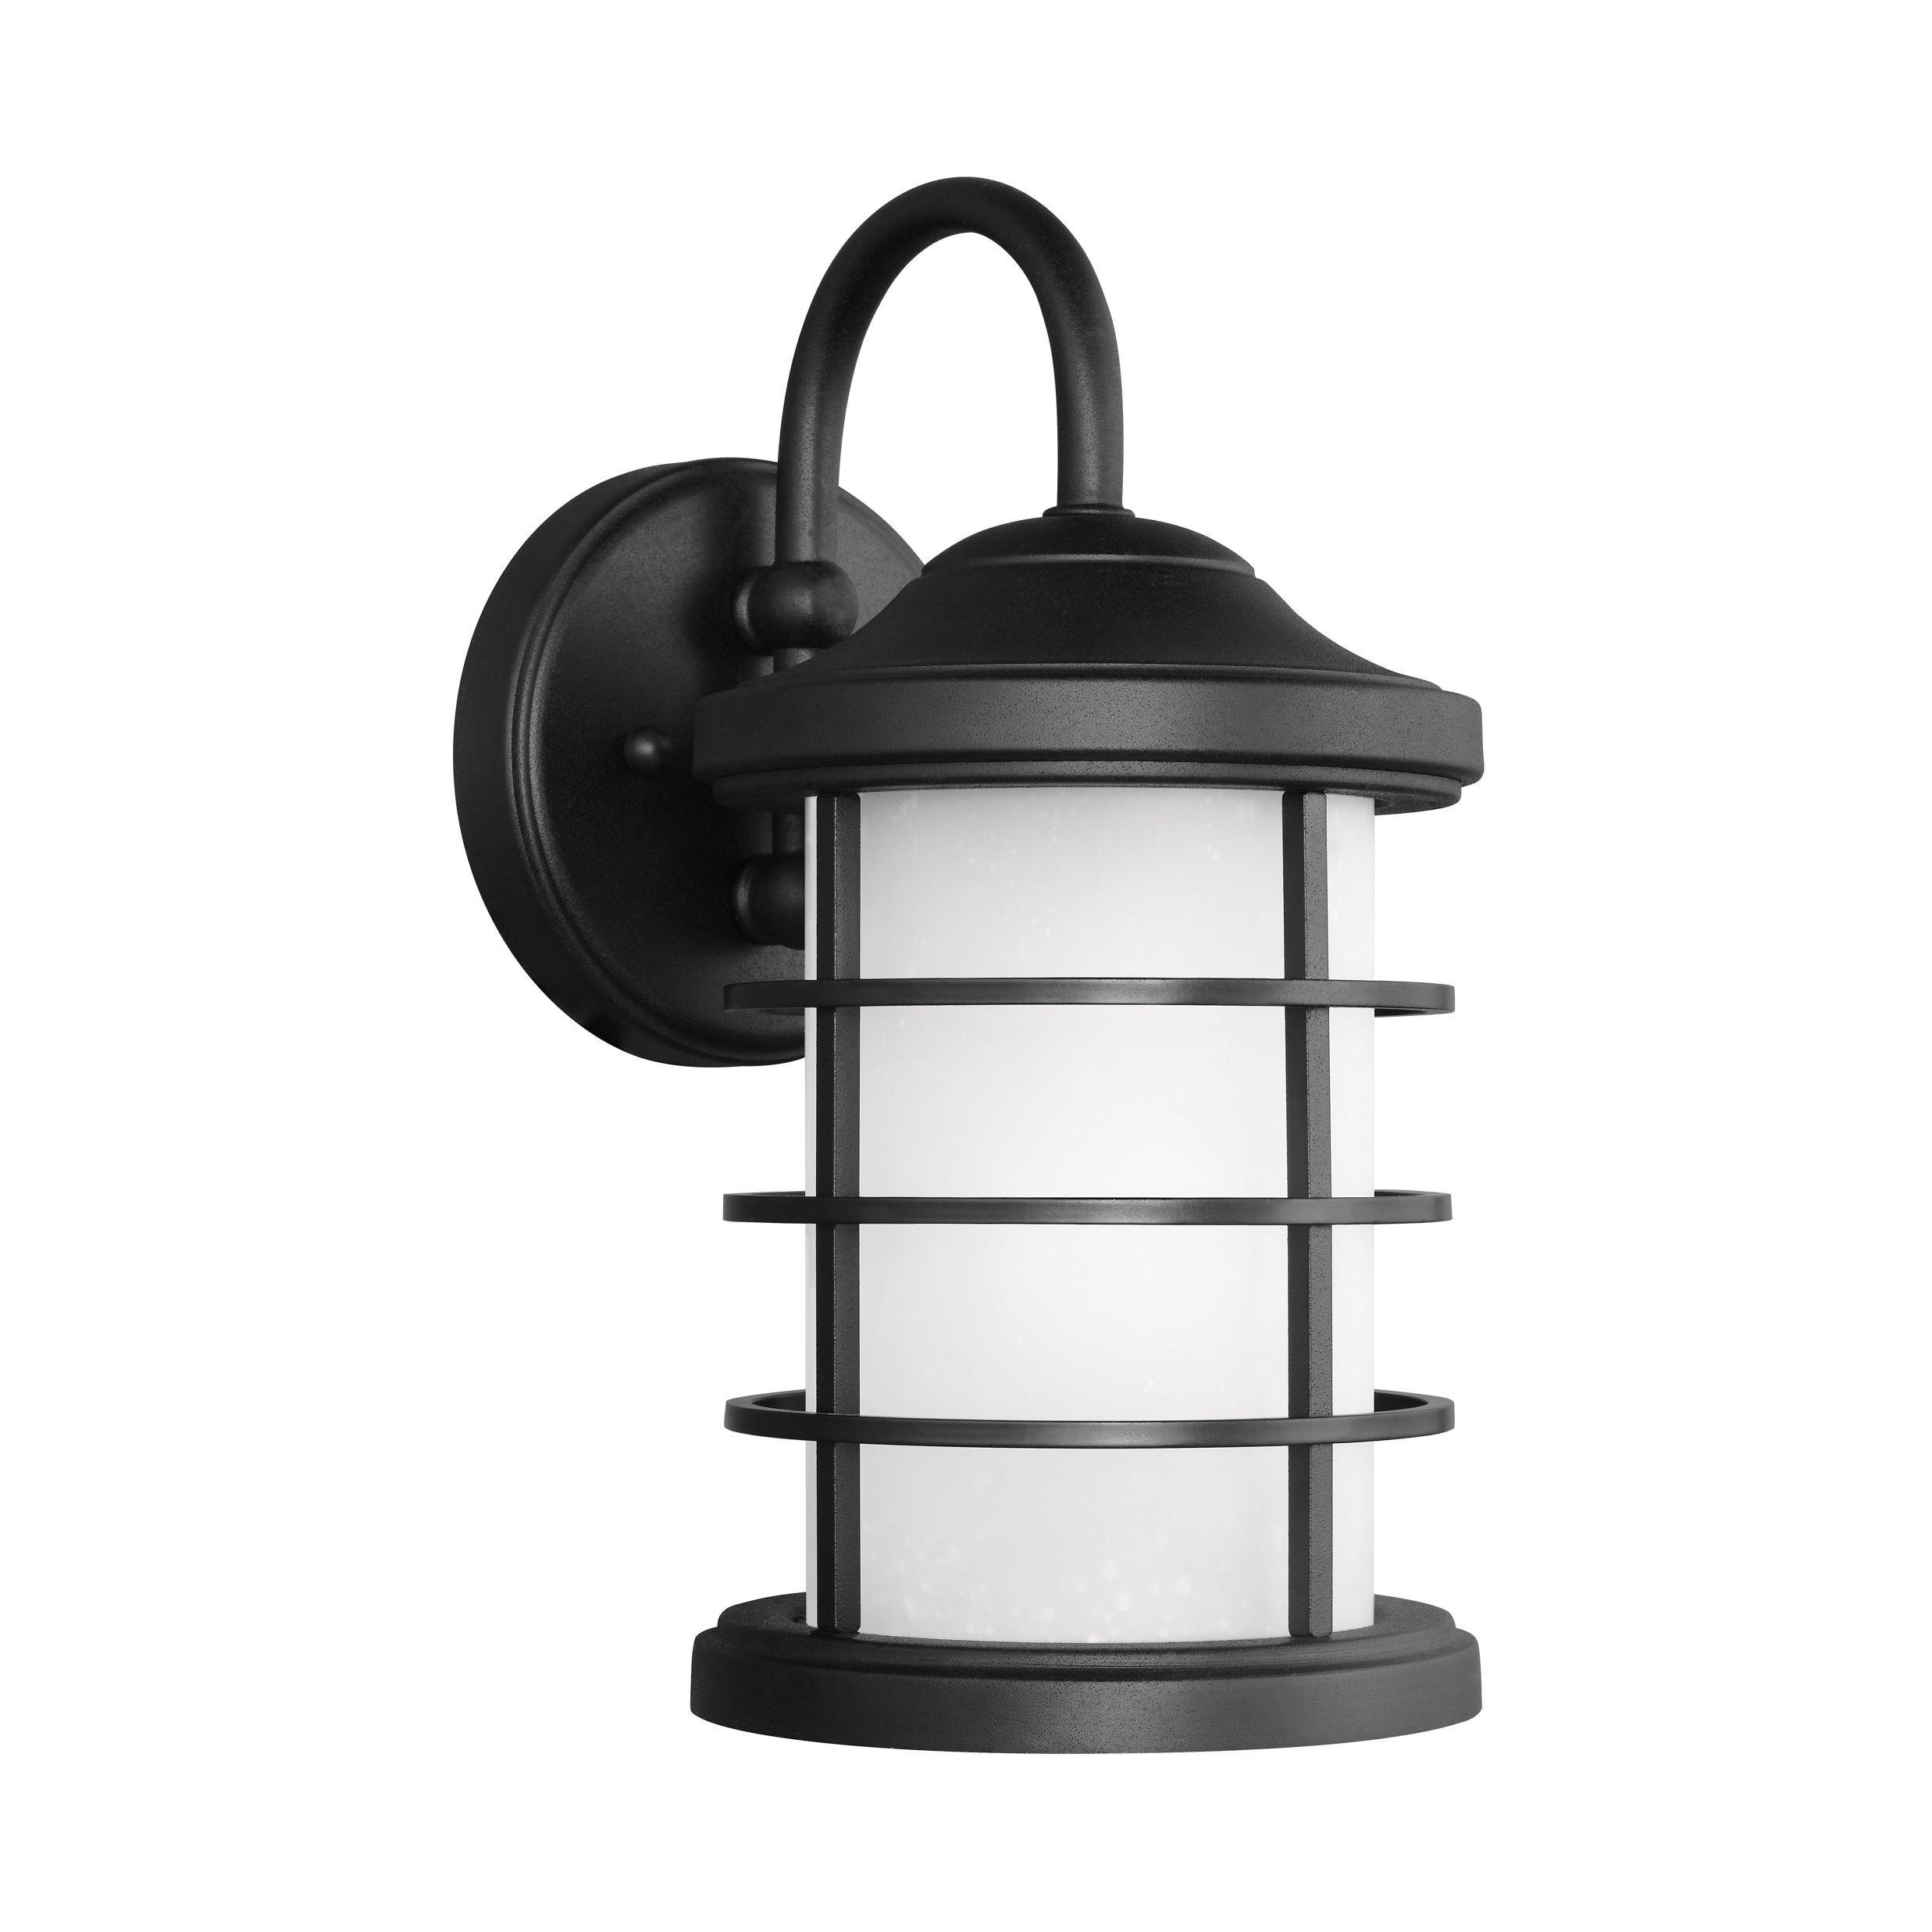 Sea gull sauganash light black outdoor fixture small one light